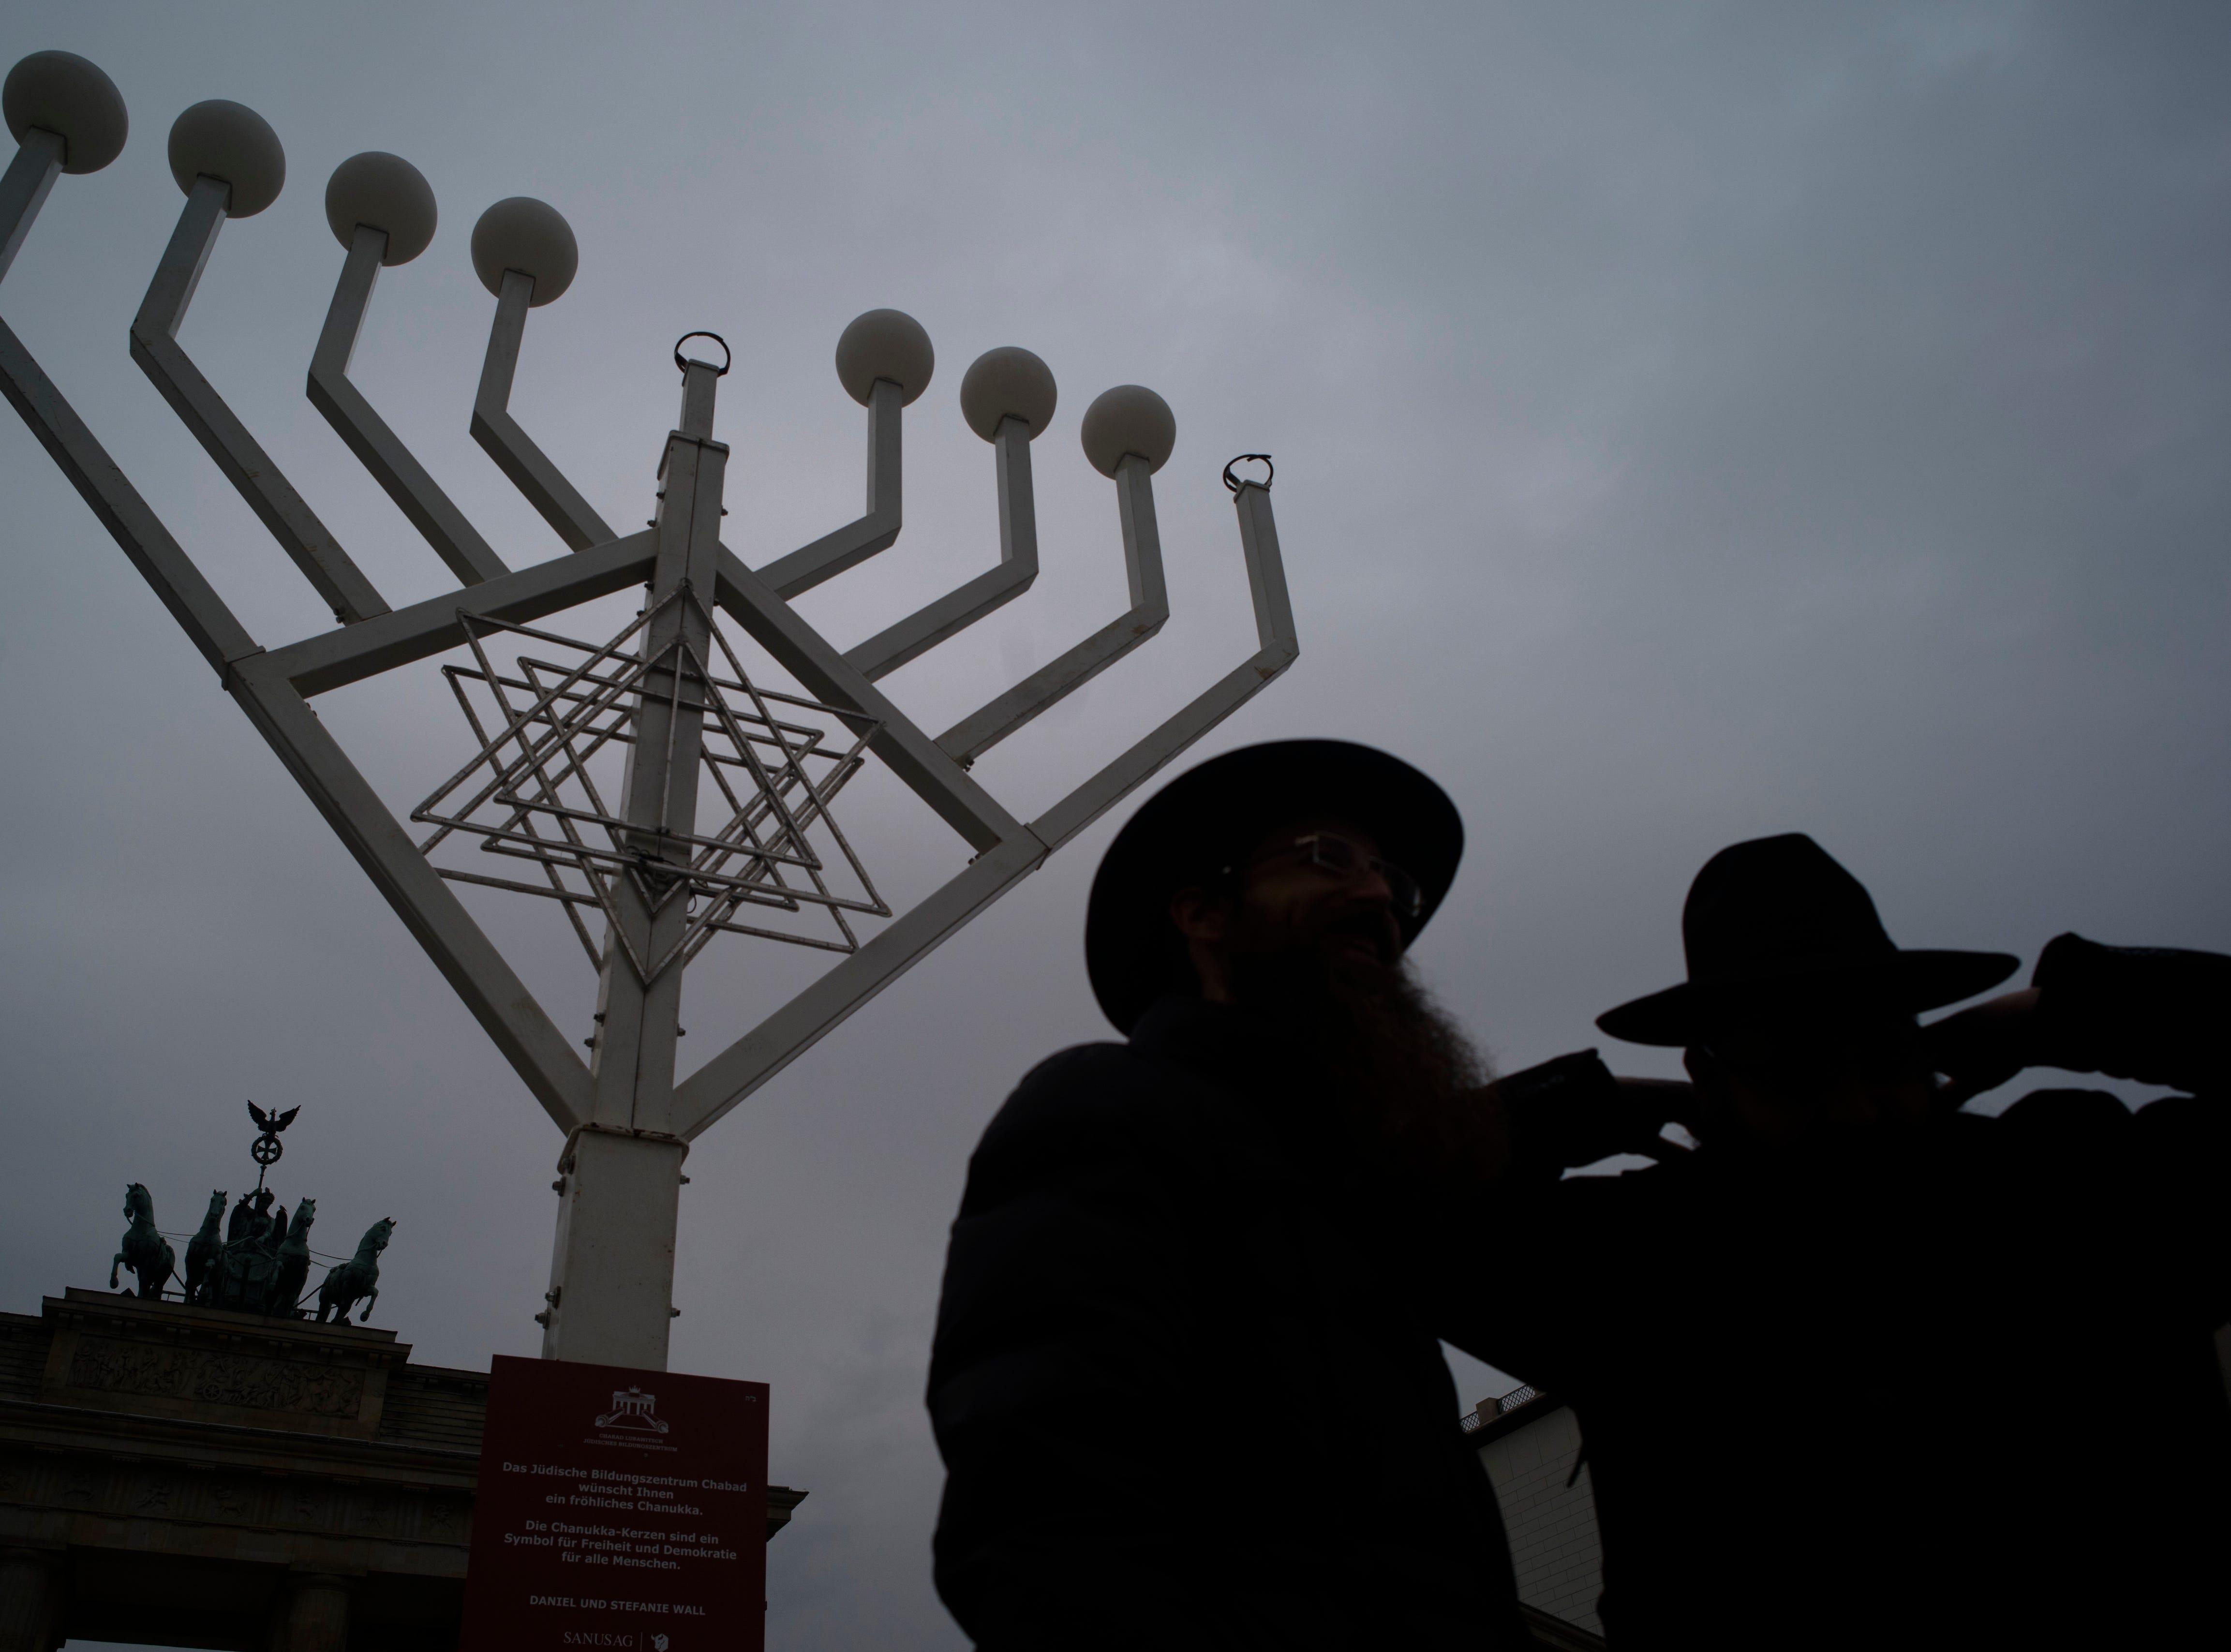 Rabbi Yehuda Teichtal, right, and Rabbi Segal Shmoel, left, inspect a giant Hanukkah Menorah, set up by the Jewish Chabad Educational Center ahead of the Jewish Hanukkah holiday, at the Pariser Platz in Berlin, Germany, Friday, Nov. 30, 2018.